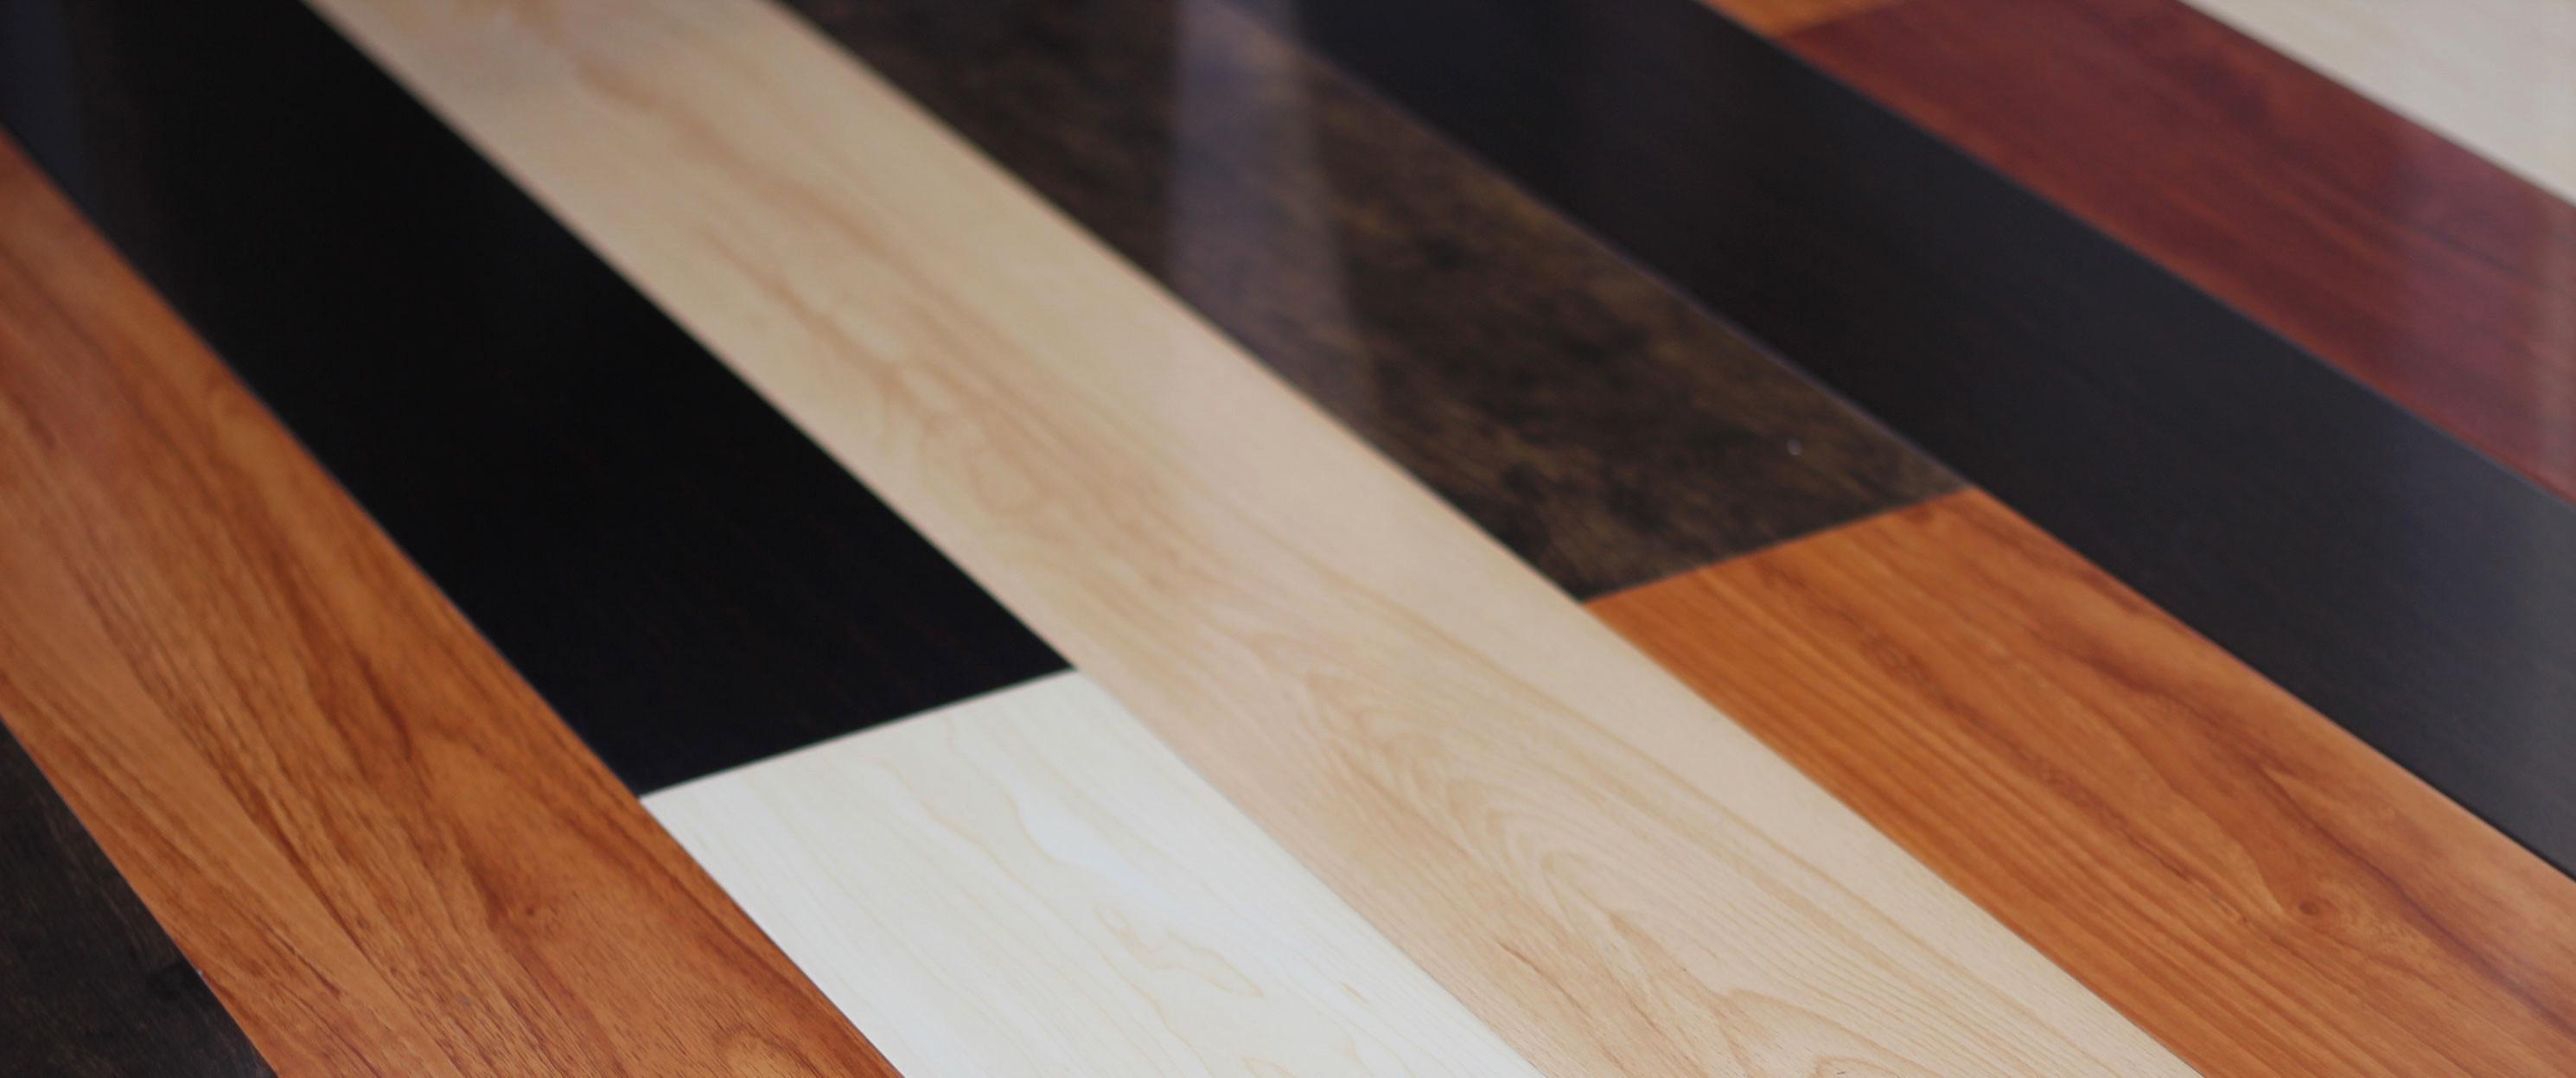 wholesale hardwood flooring online of cheap hardwood flooring floor plan ideas pertaining to cheap hardwood flooring where to buy hardwood flooring inspirational 0d grace place barnegat